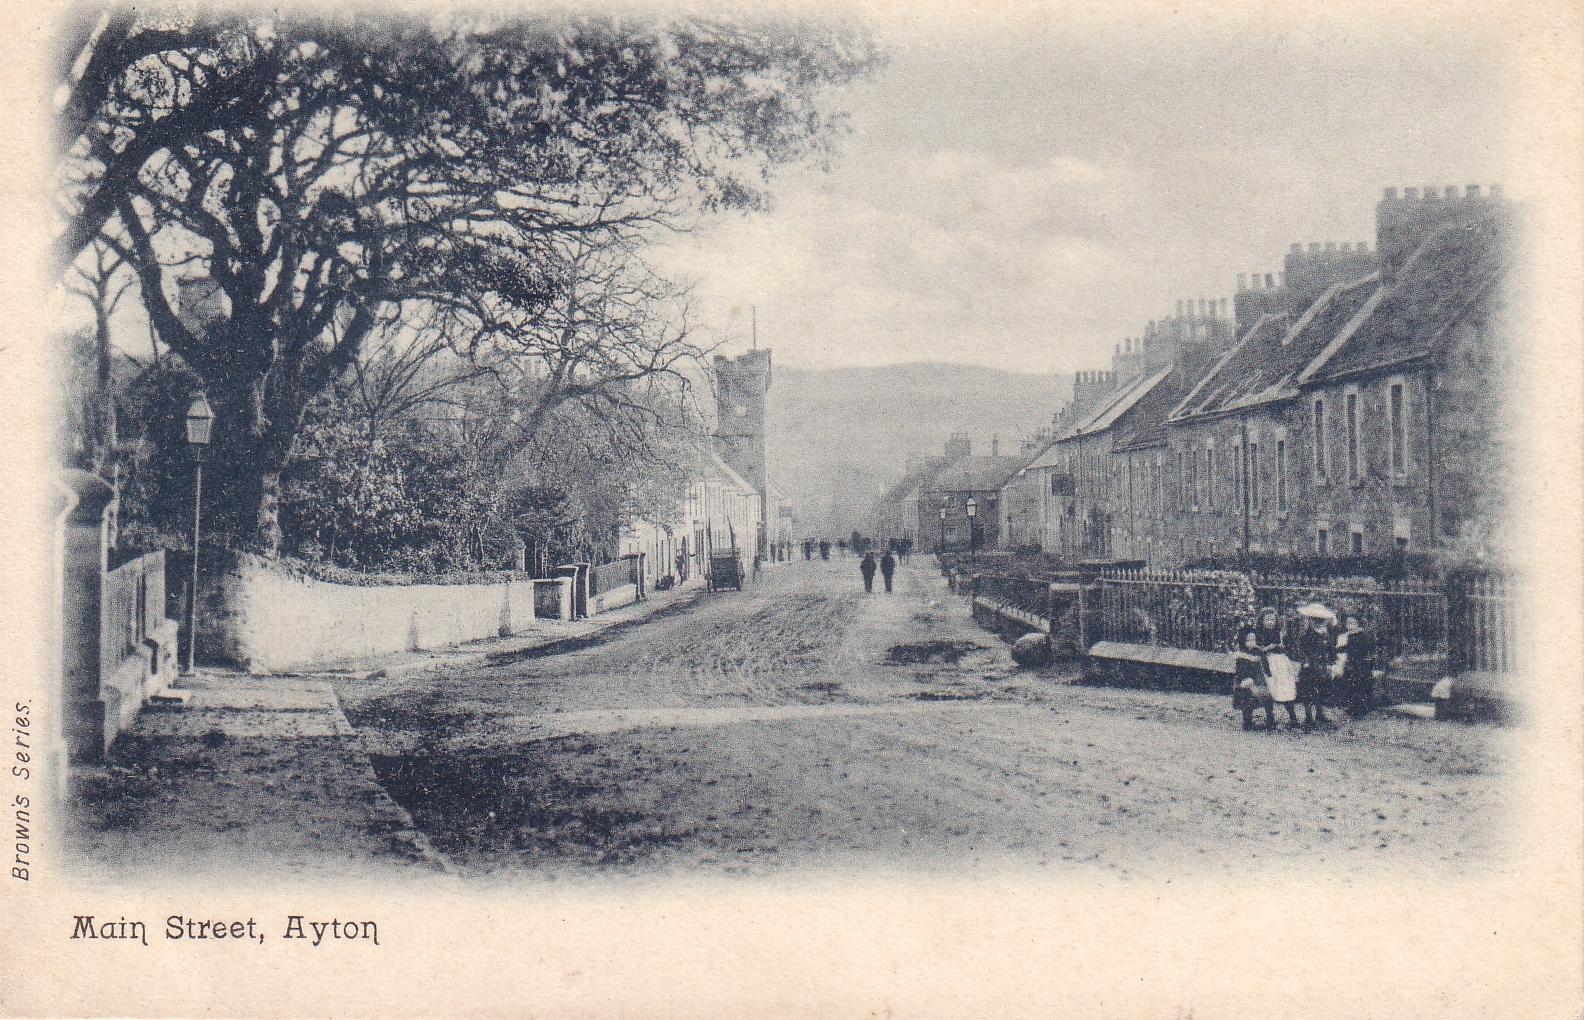 Main Street Ayton